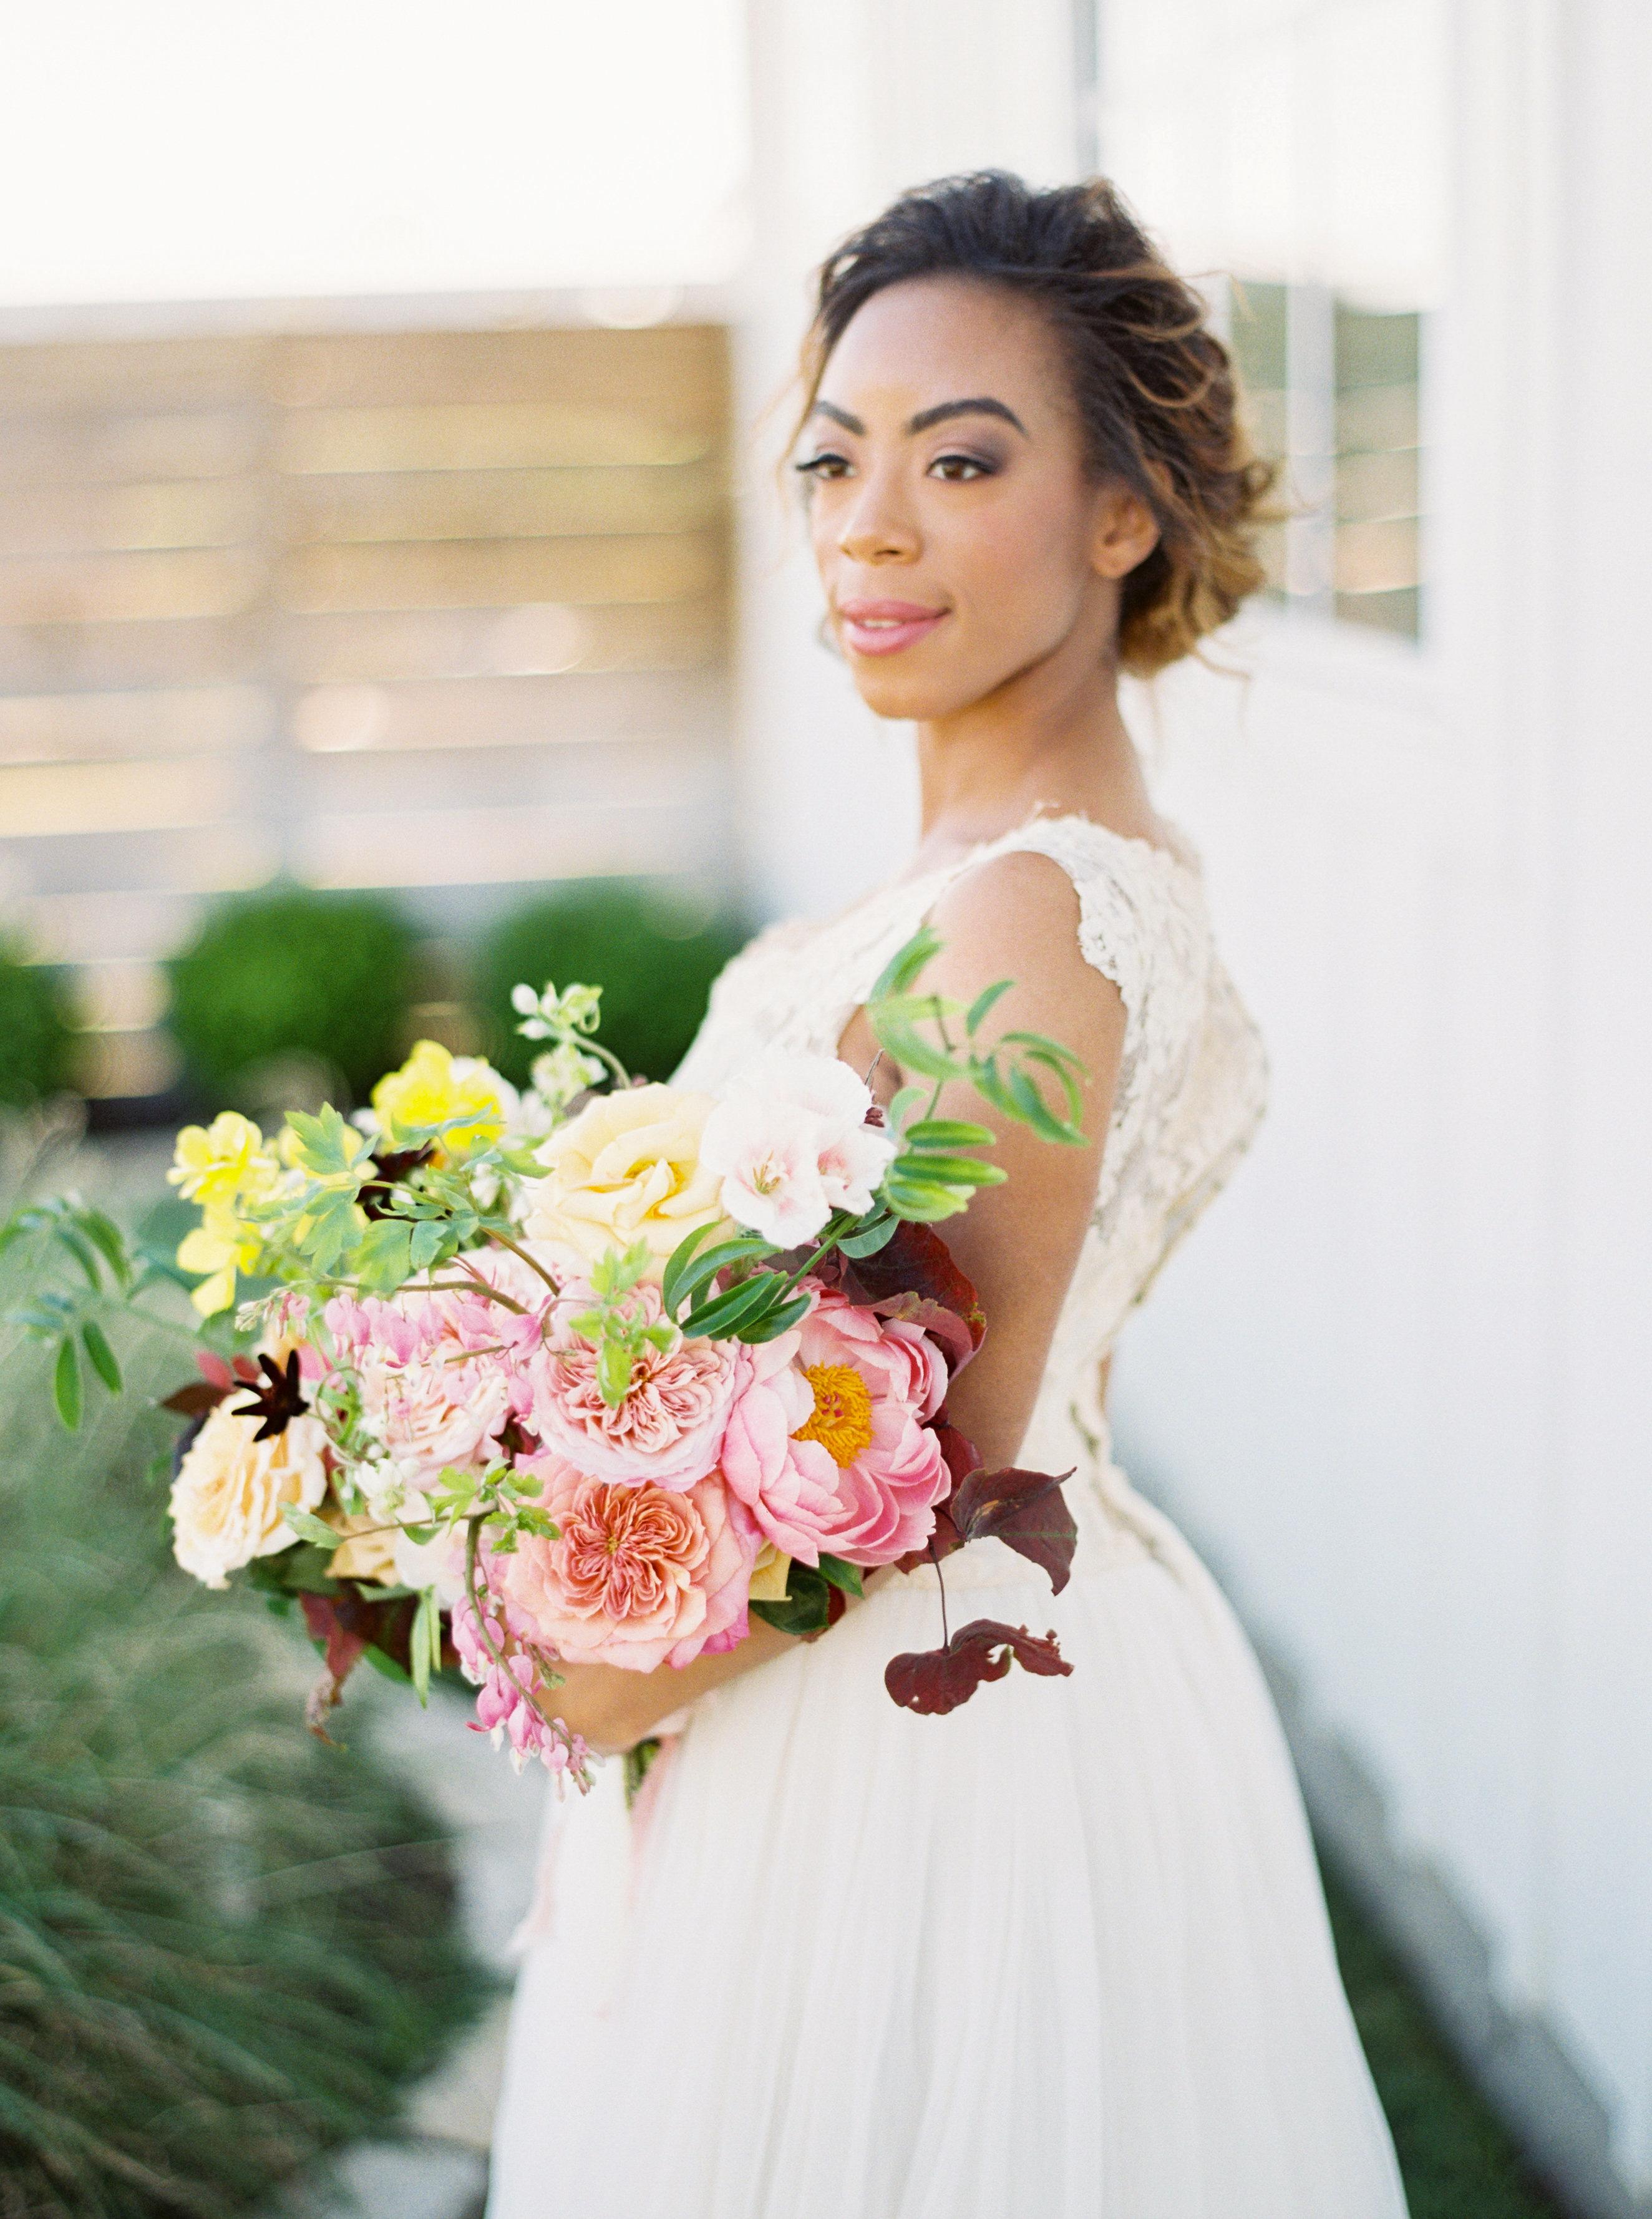 55 Simple Wedding Hairstyles That Prove Less Is More | Martha Stewart Weddings